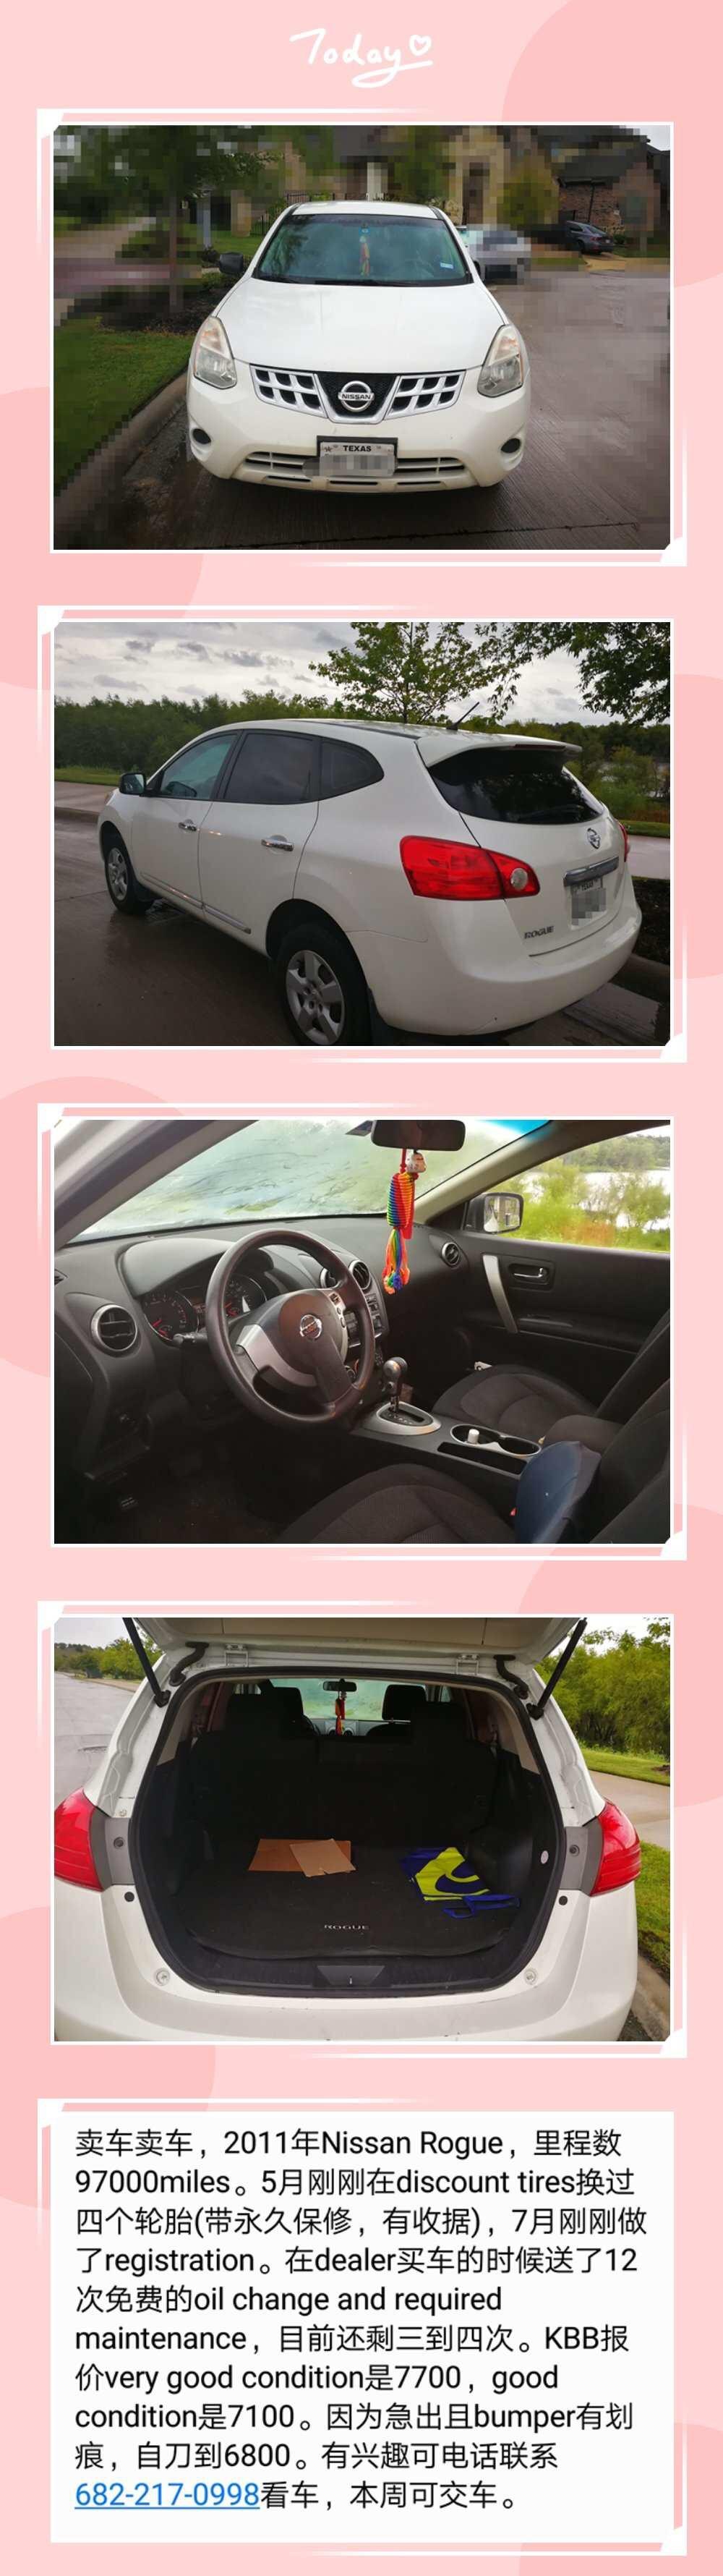 卖车-2011 Nissan rogue